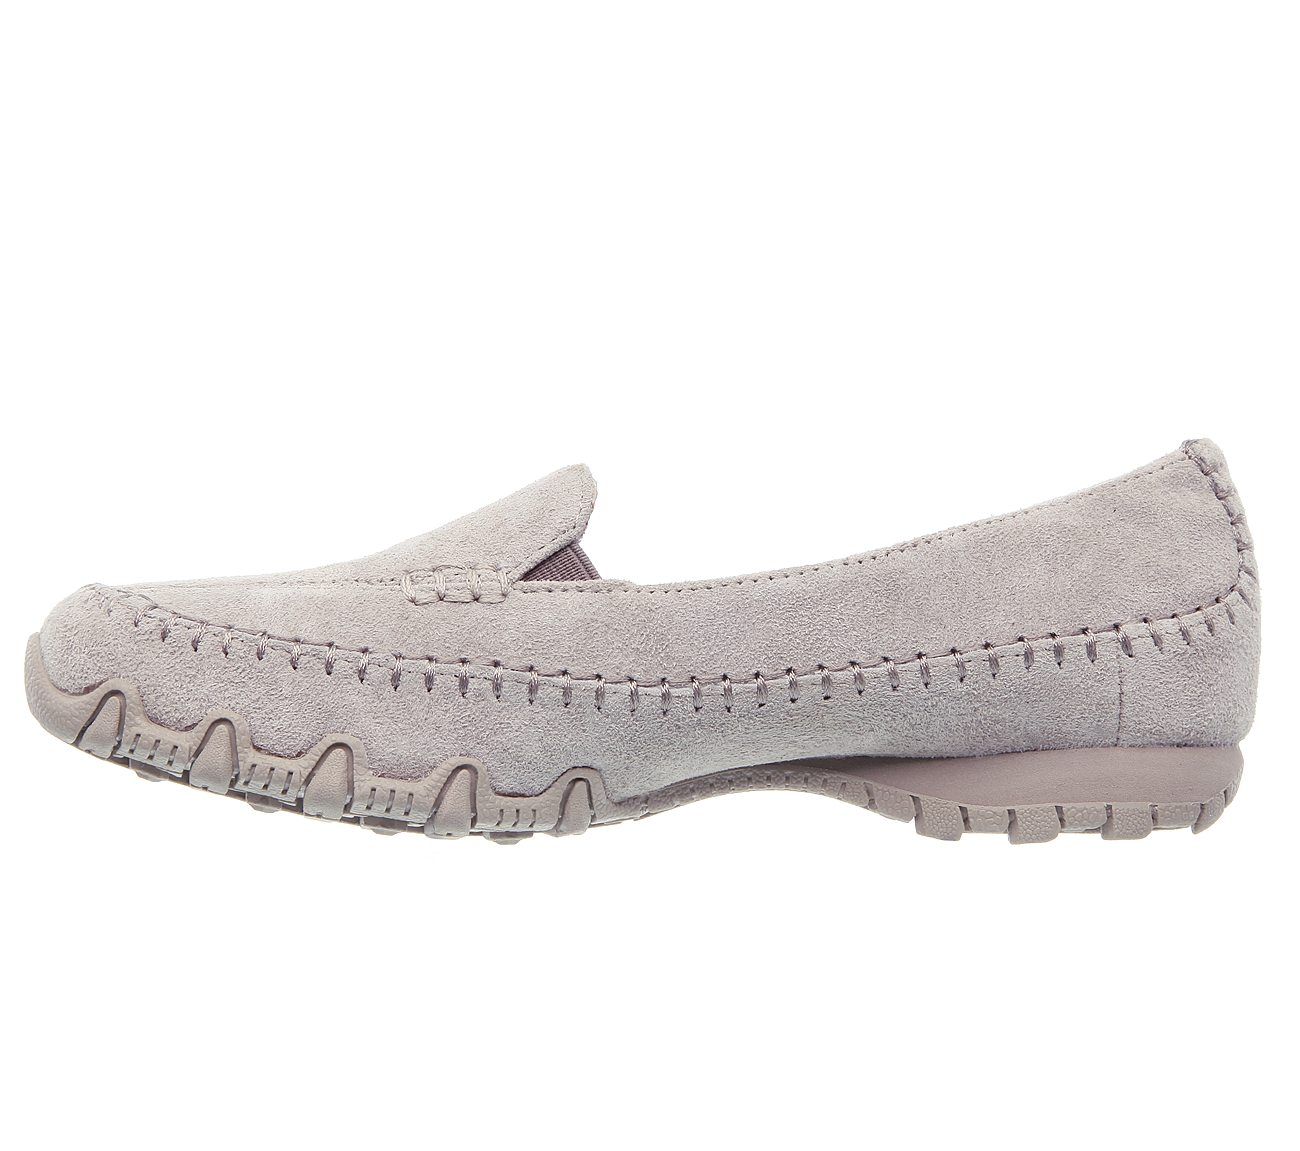 Bajo invadir Hacia fuera  Buy SKECHERS Relaxed Fit: Bikers - Pedestrian SKECHERS Modern Comfort Shoes